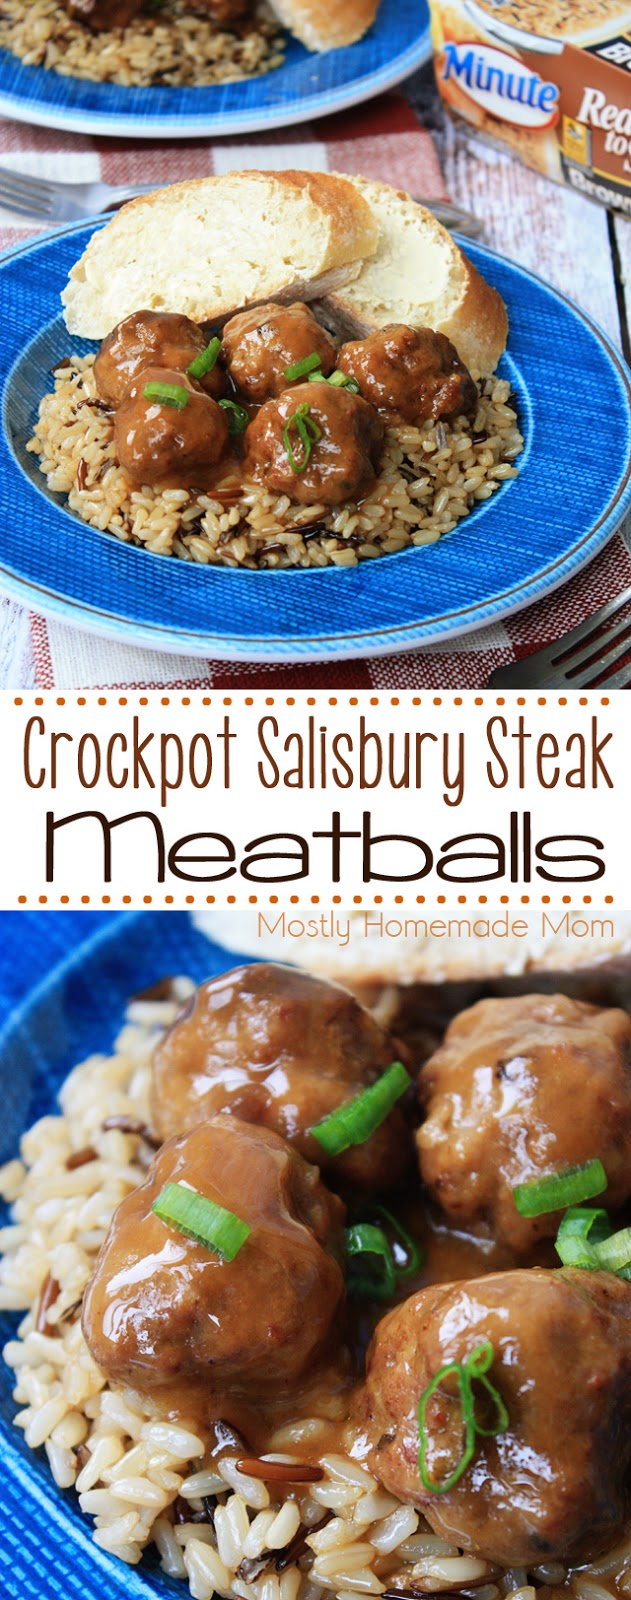 Crockpot Recipe for Salisbury Steak Meatballs